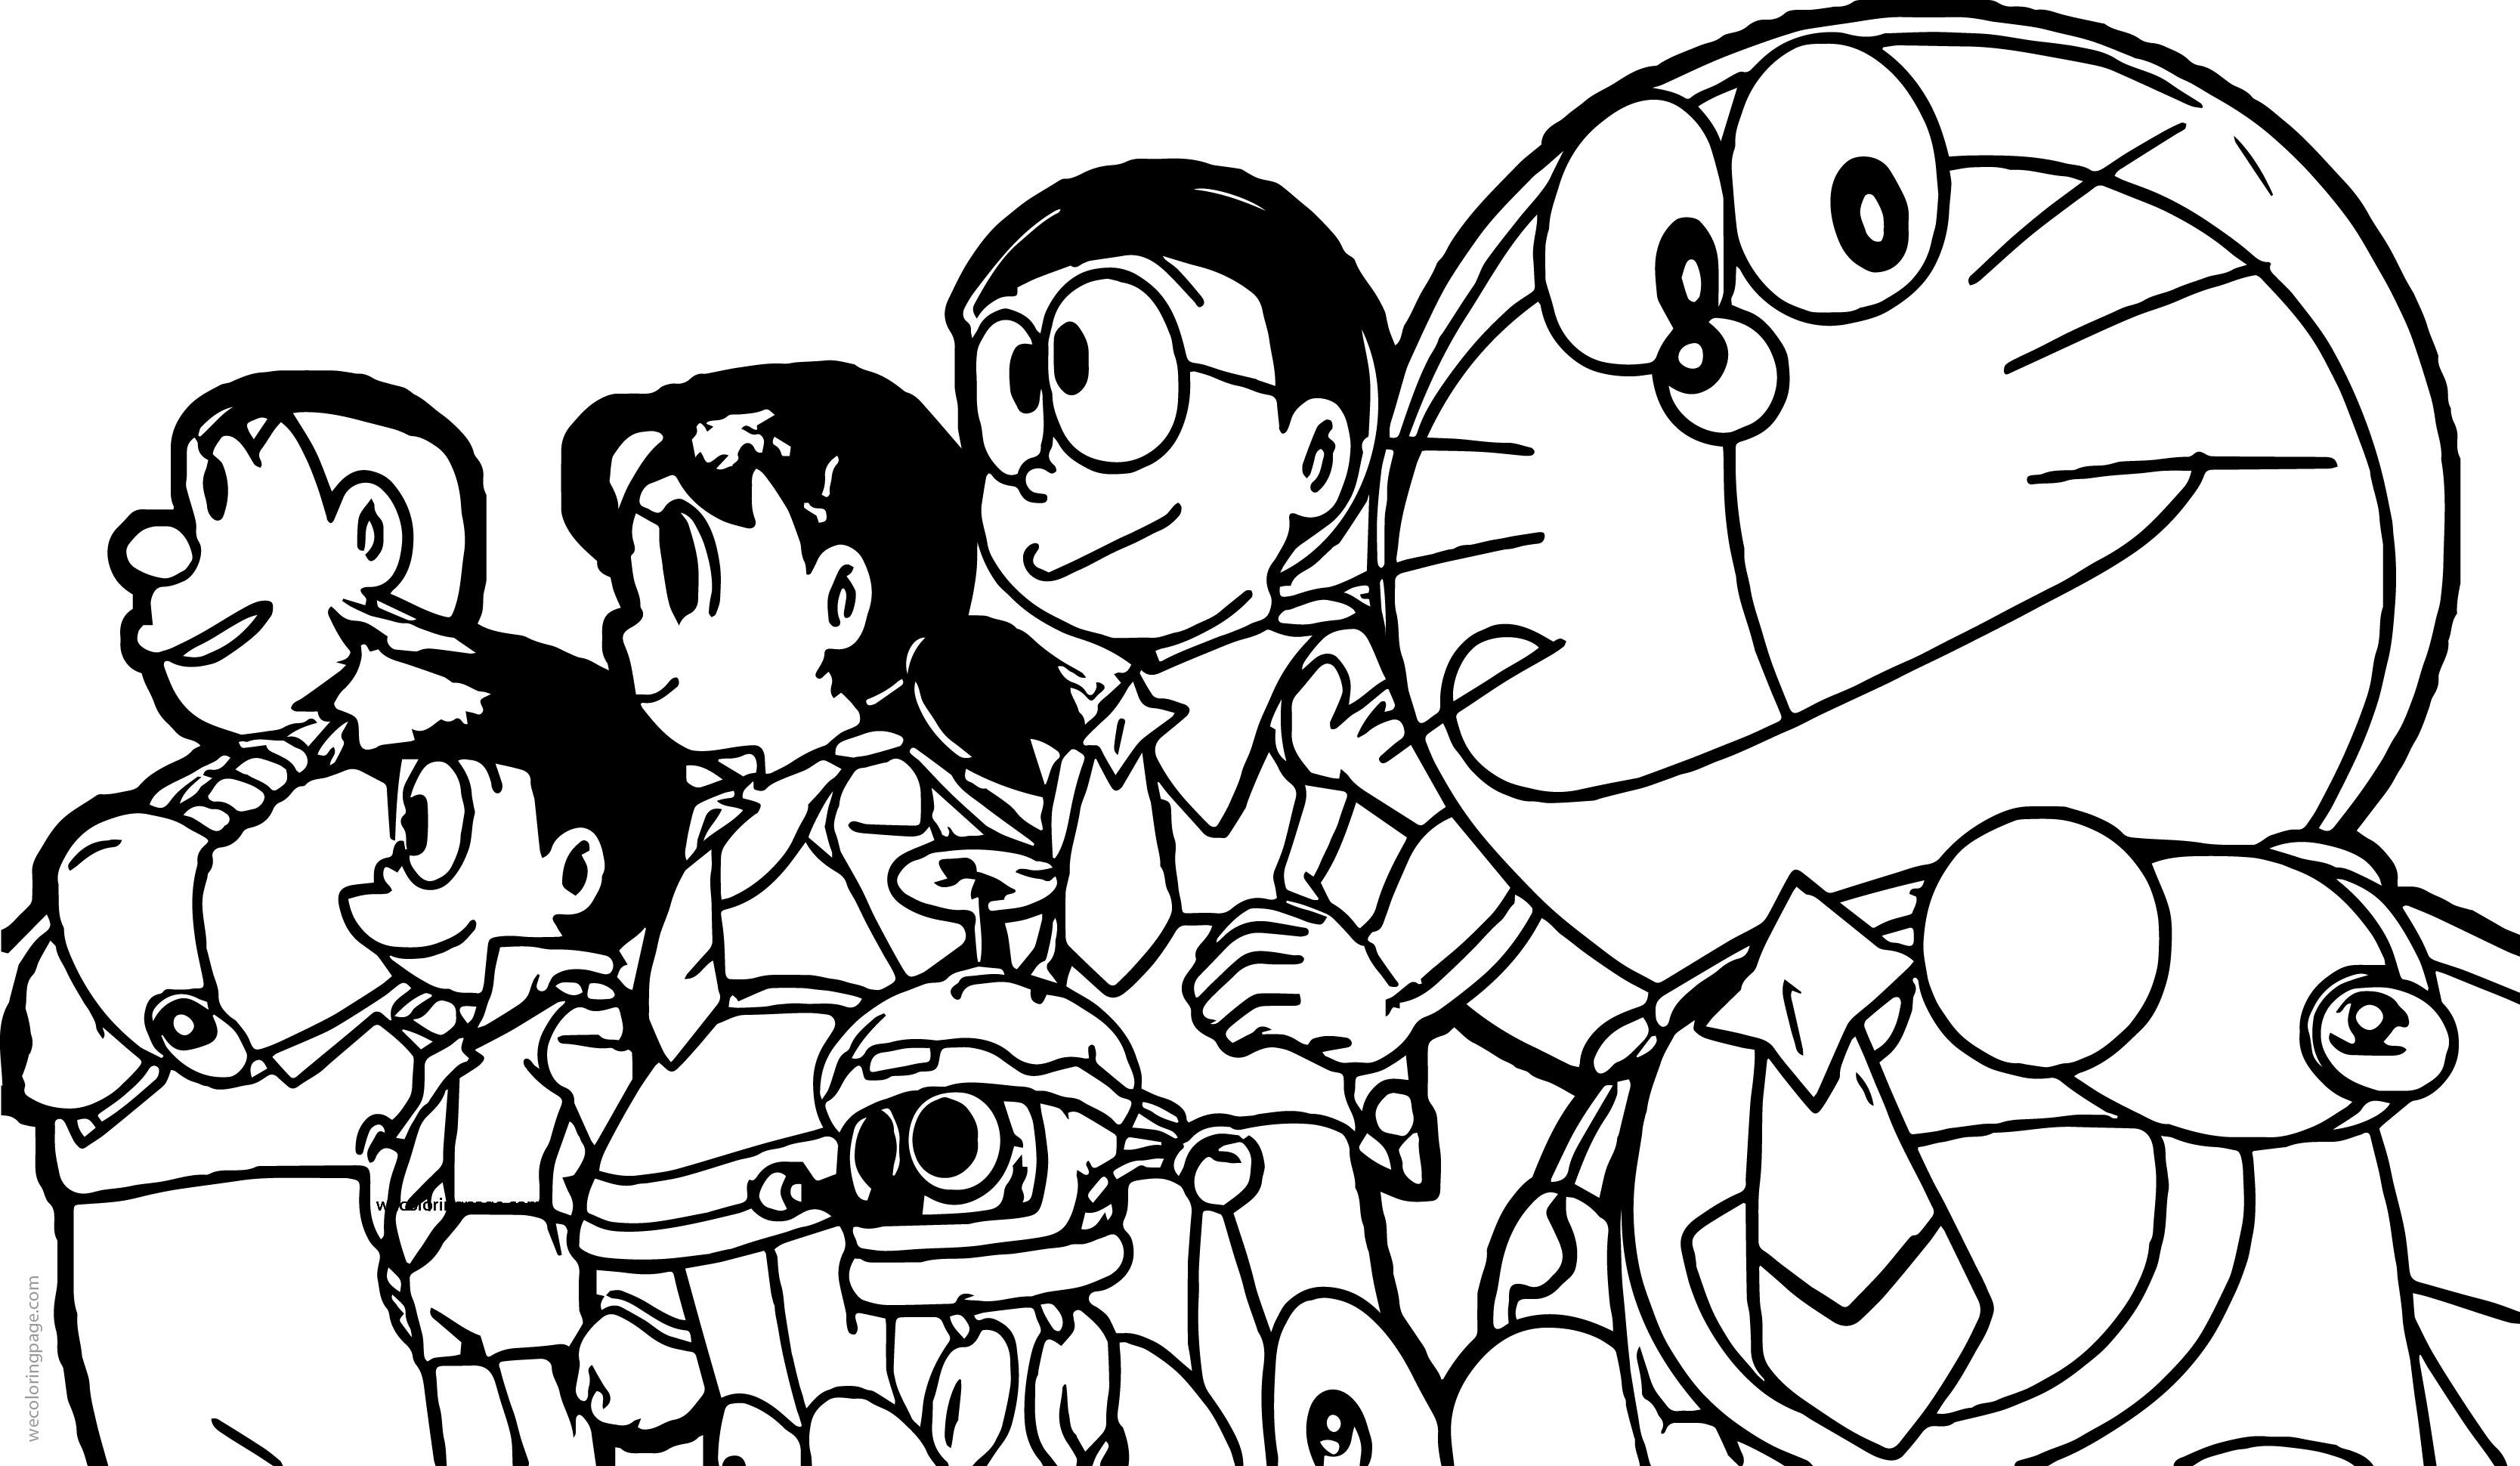 Doraemon Photo Coloring Page